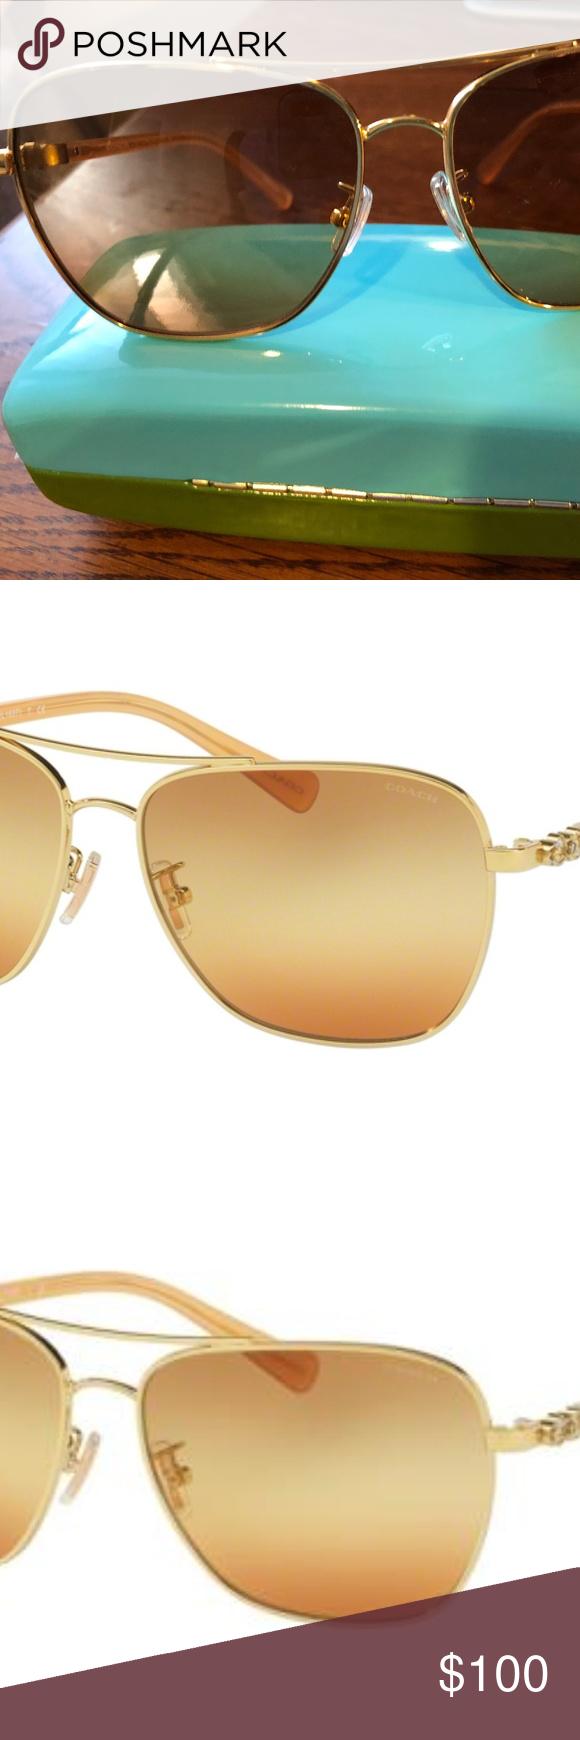 44387877c30da Coach Women Sunglasses Frame Color  9305W8 Gold